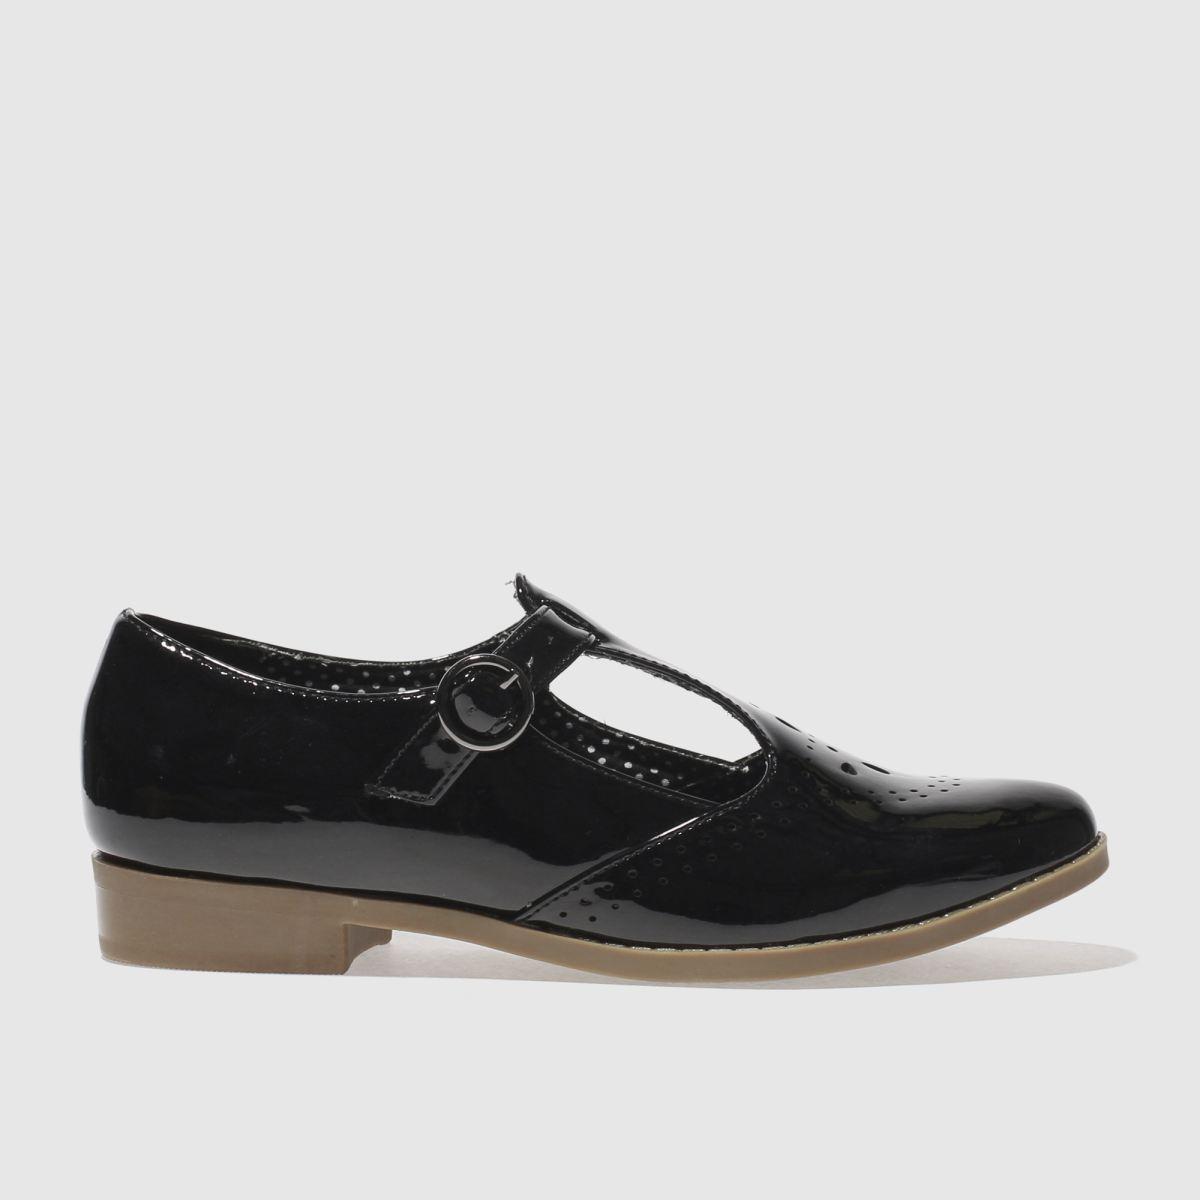 schuh Schuh Black Pretty Baby Flat Shoes